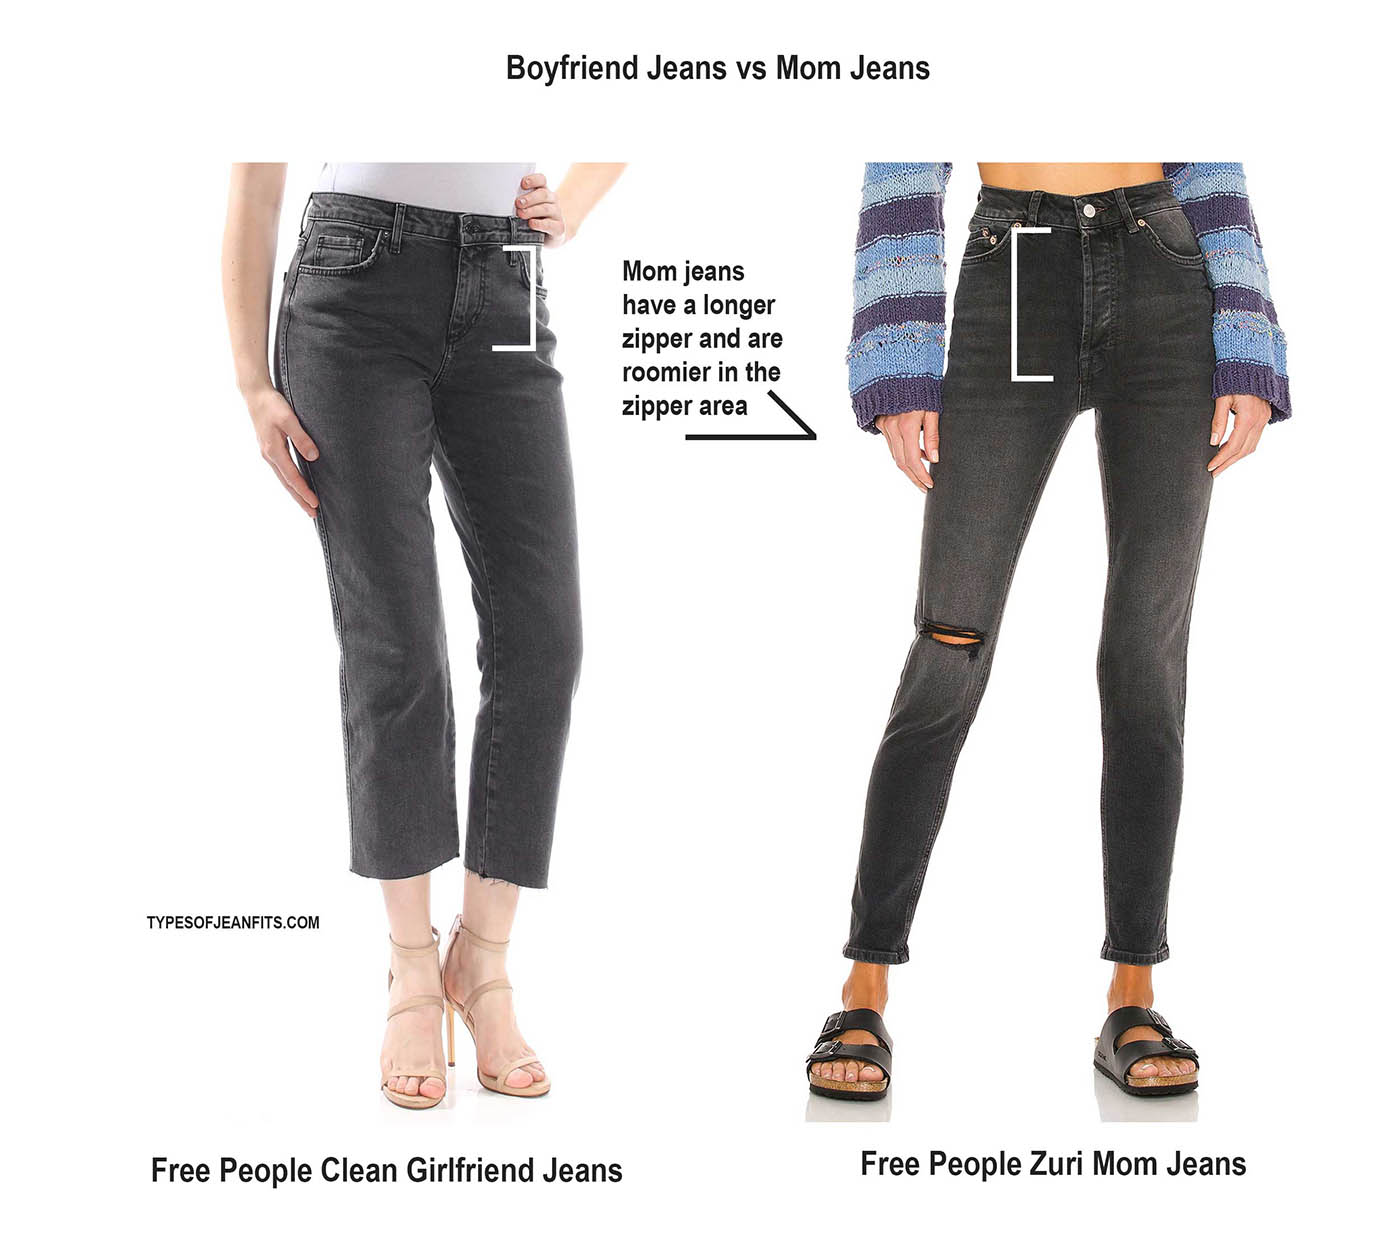 Boyfriend Jeans vs Mom Jeans, 5 comparisons by brand